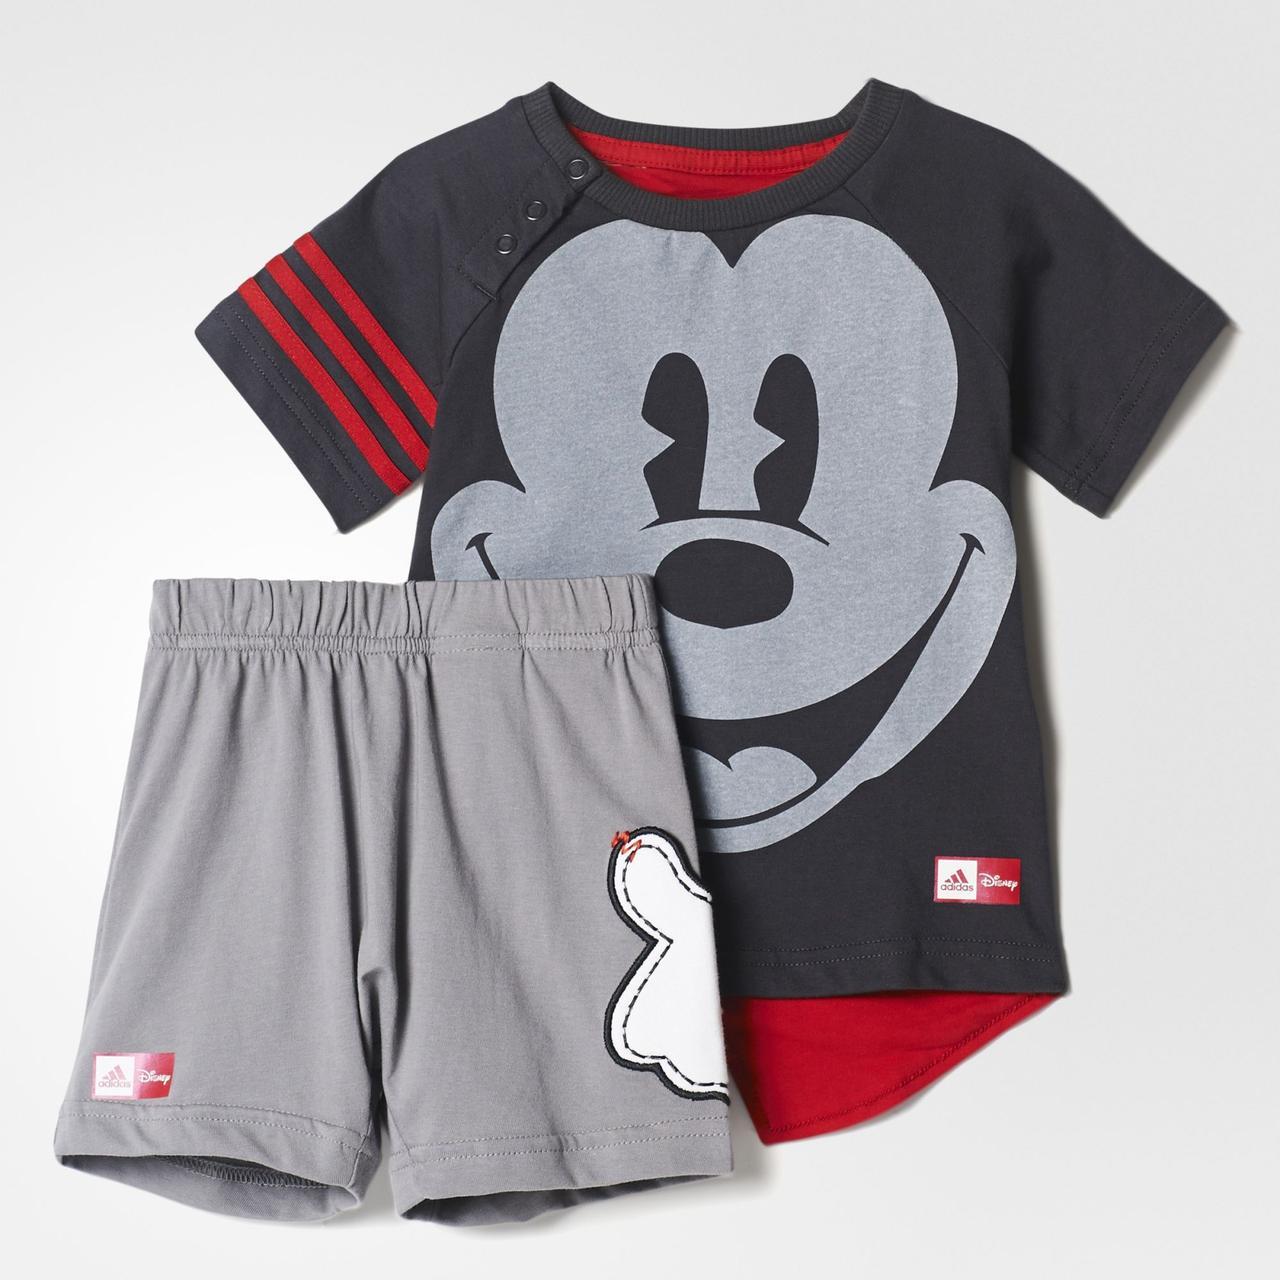 32908c07bb1 Комплект  футболка и шорты Adidas Disney Mickey Mouse - Popsport.com.ua ‒